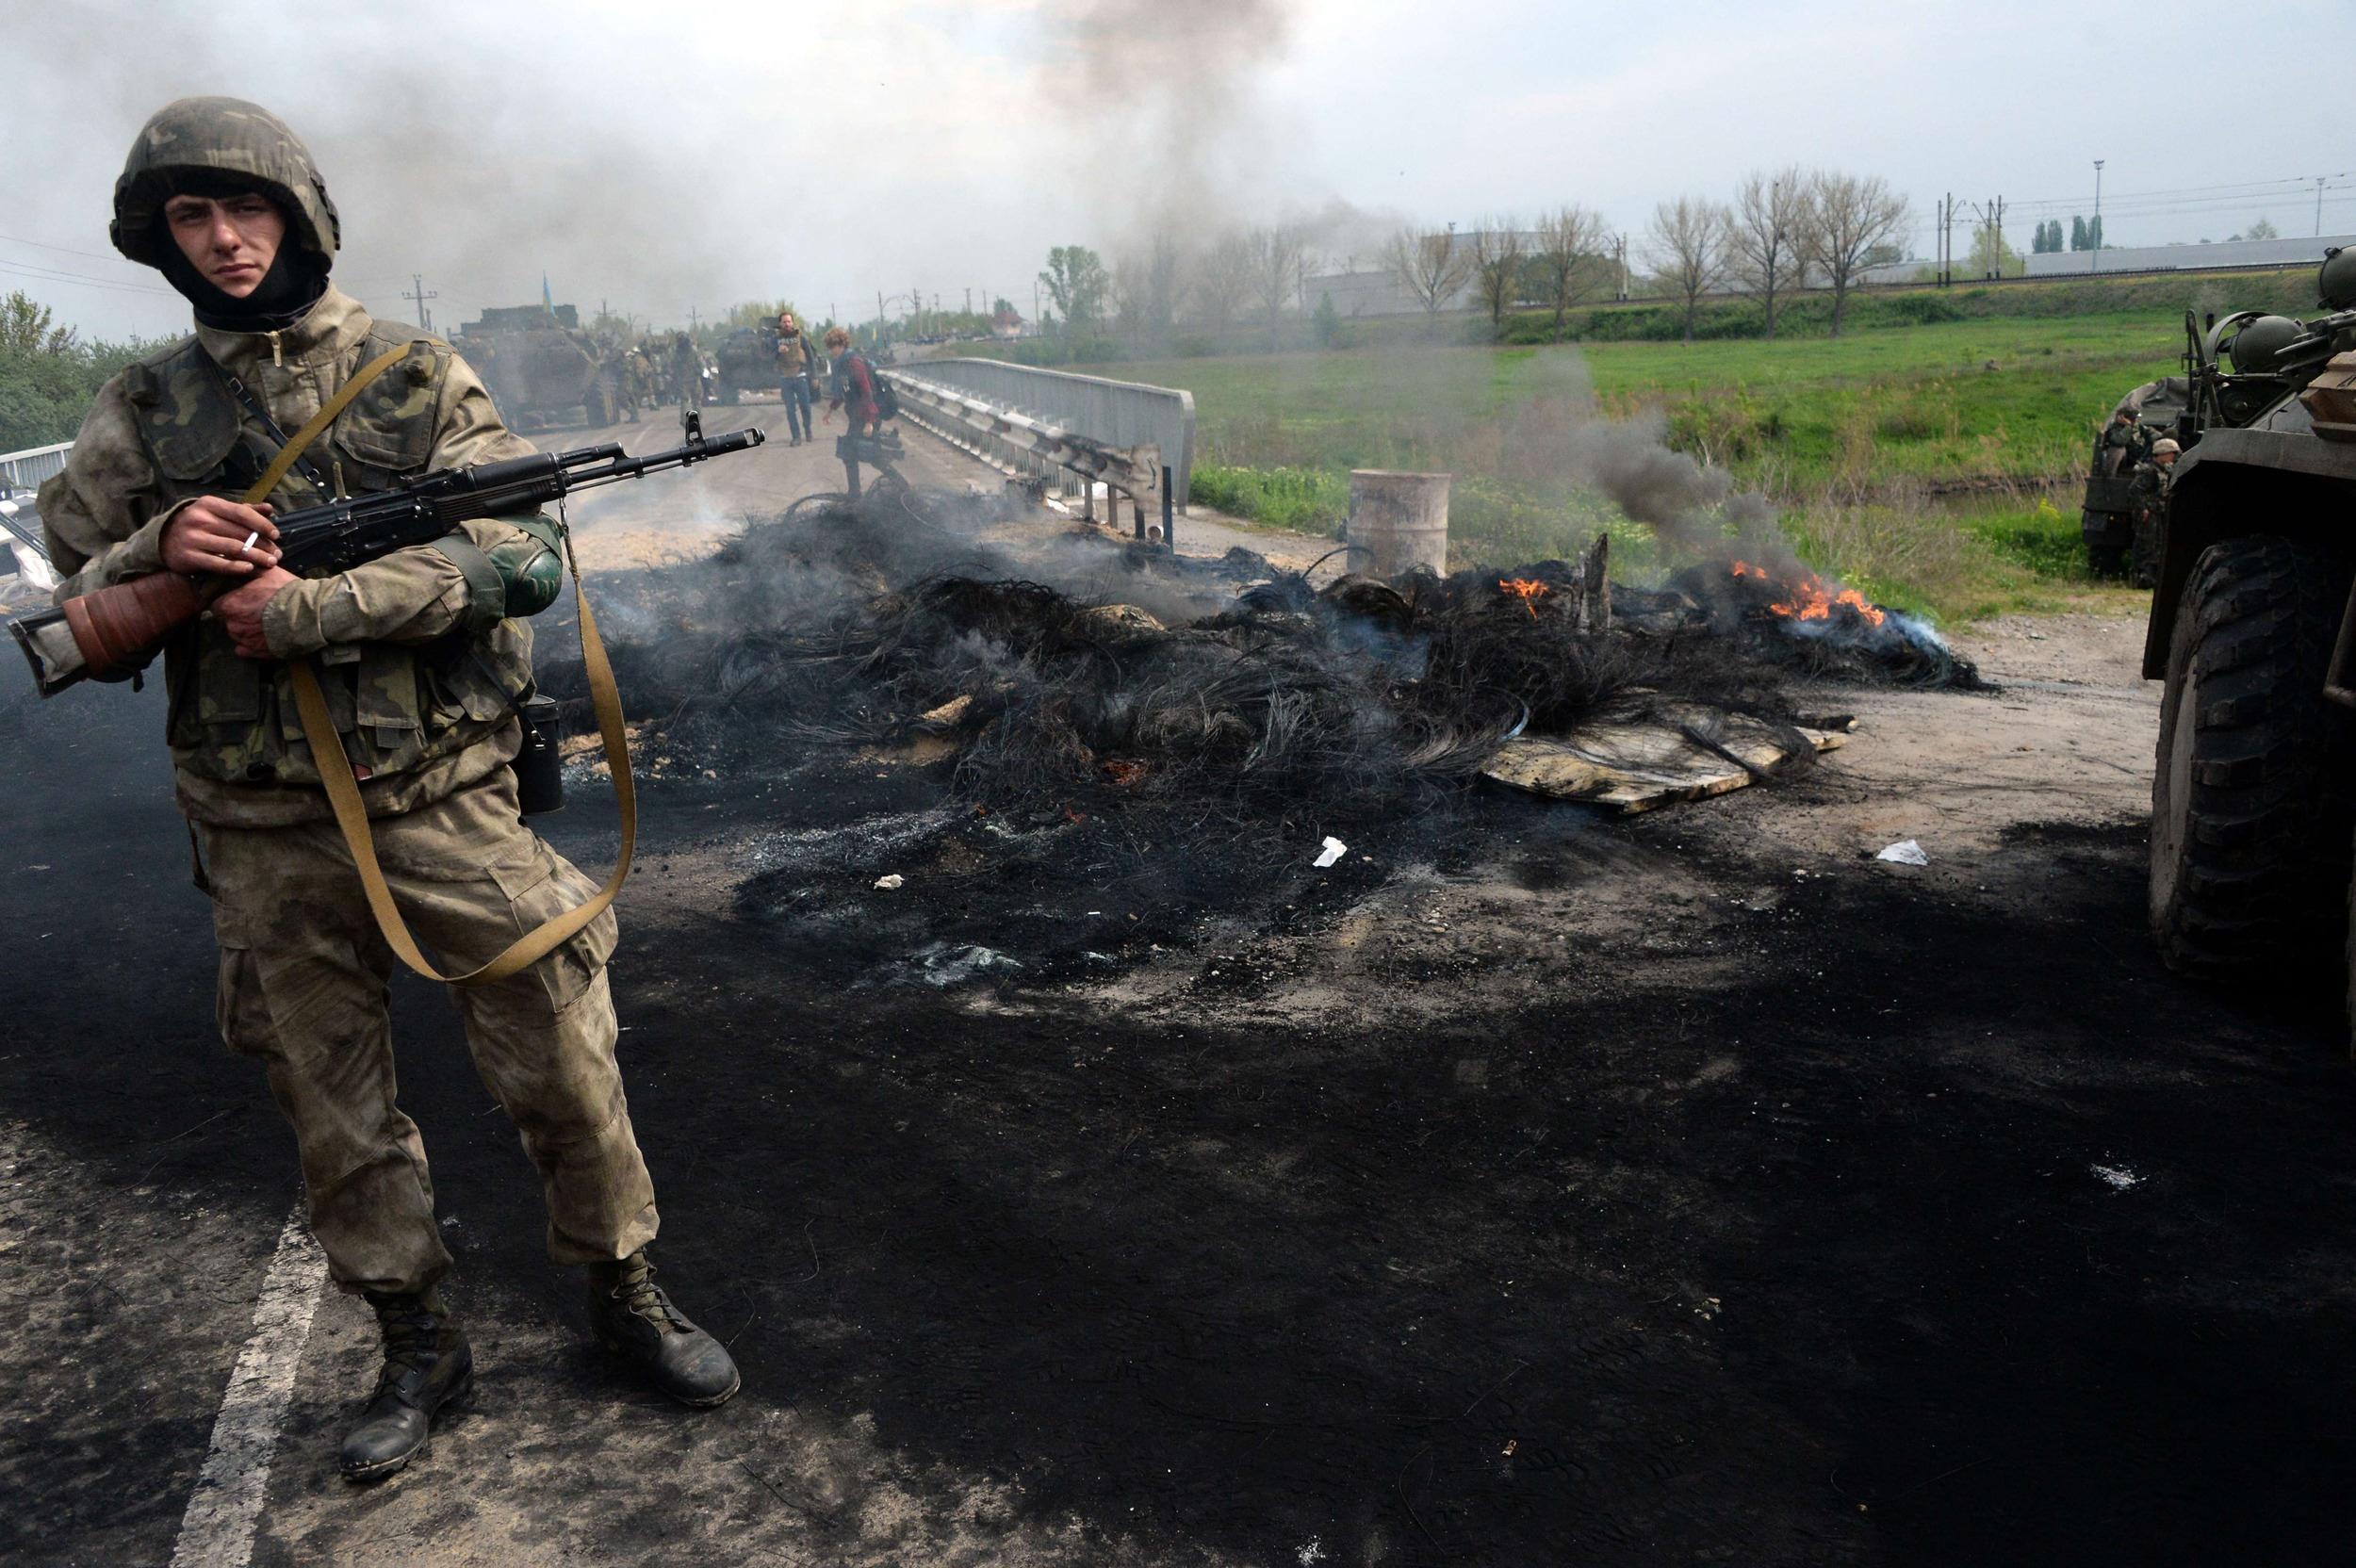 Image: UKRAINE-RUSSIA-POLITICS-CRISIS-SLAVYANSK